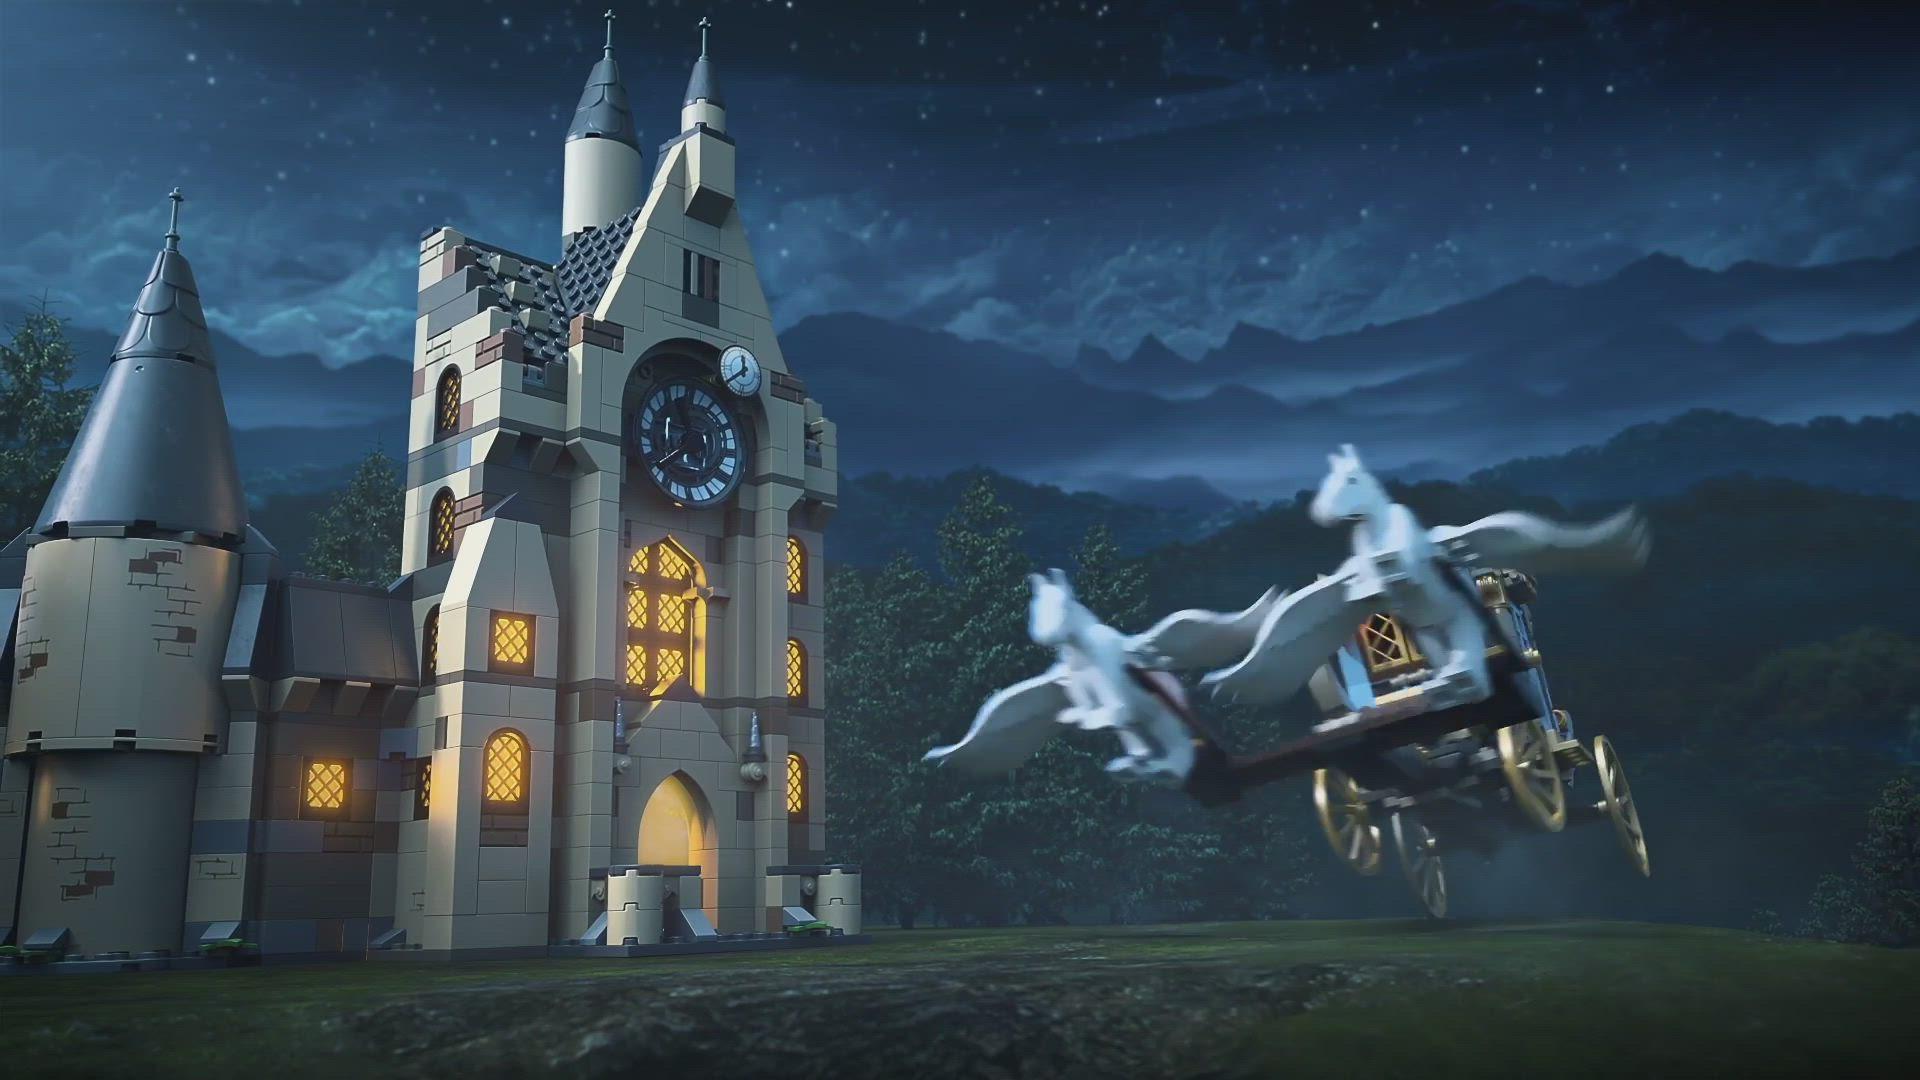 Hogwarts Yule Ball Discover Your Hogwarts Lego Harry Potter Videos Lego Com For Kids Us